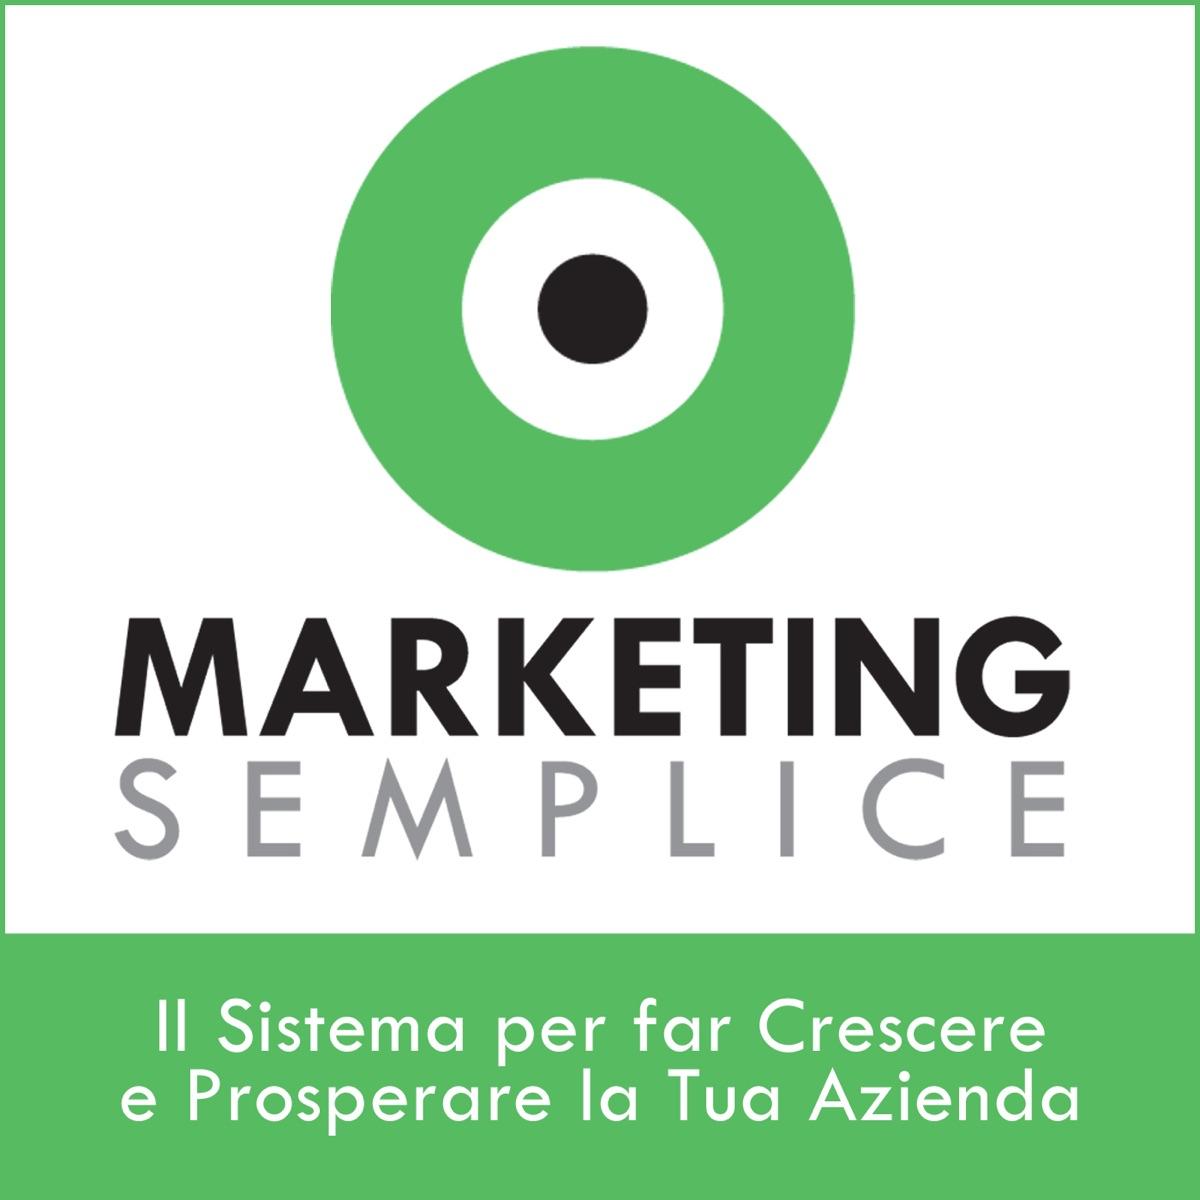 Marketing Semplice